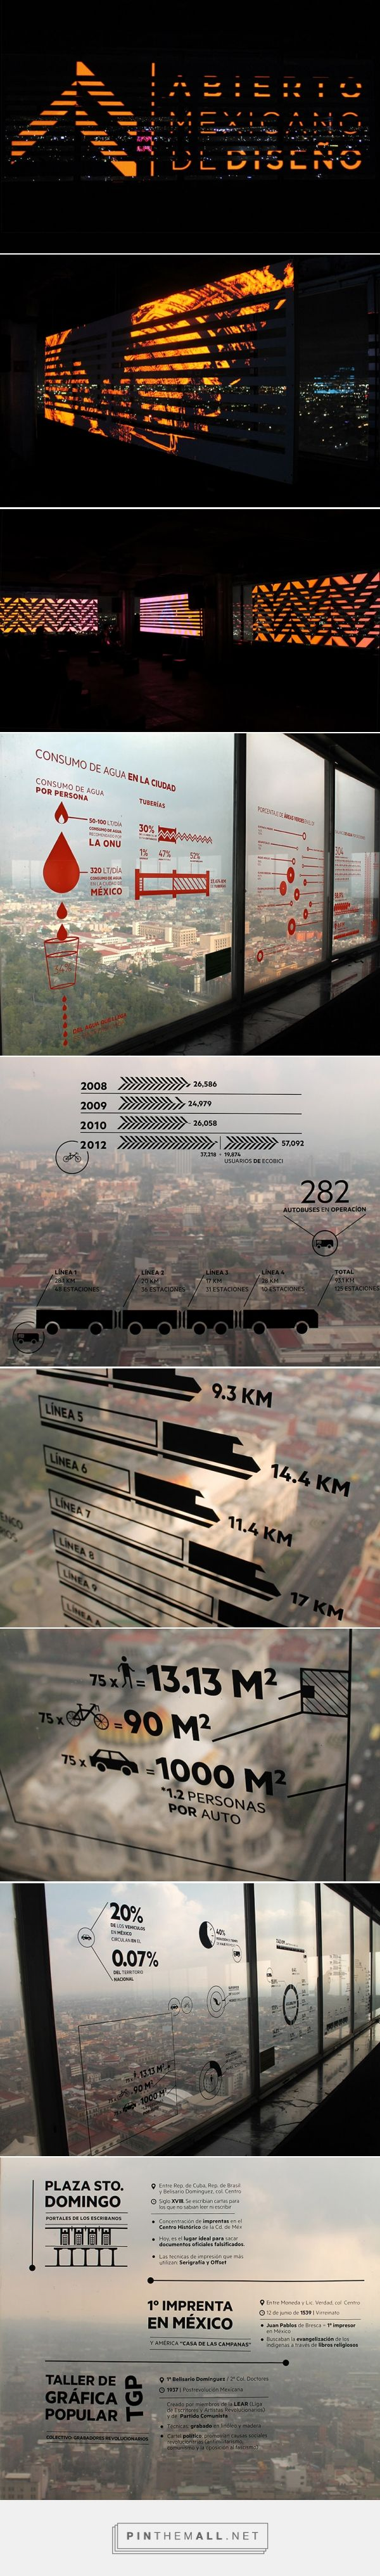 observatory digital city installation by citrico grafico